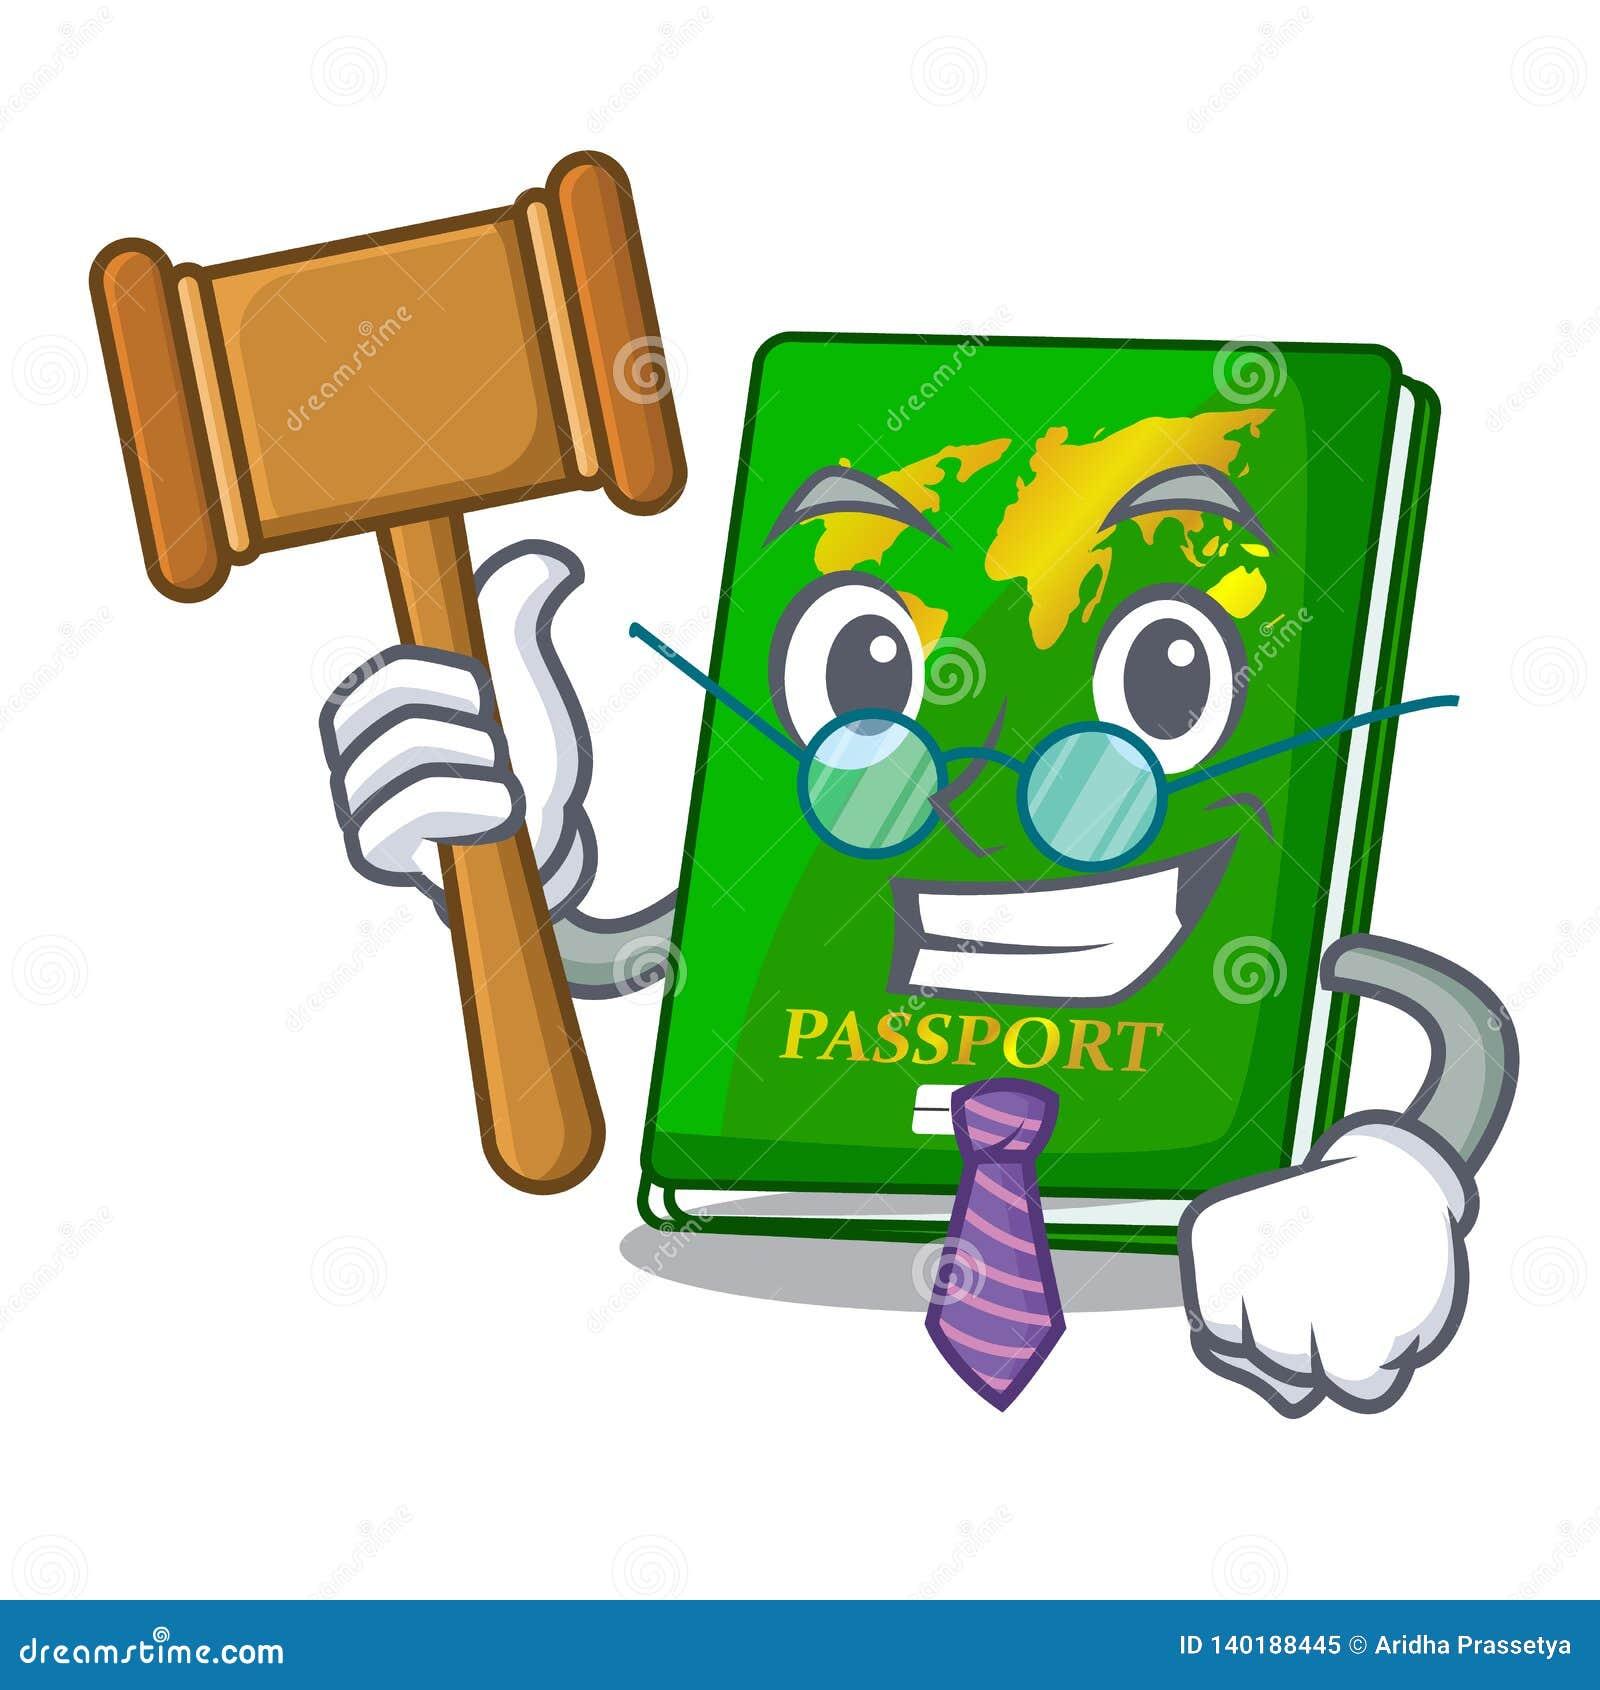 Judge green passport on the mascot table